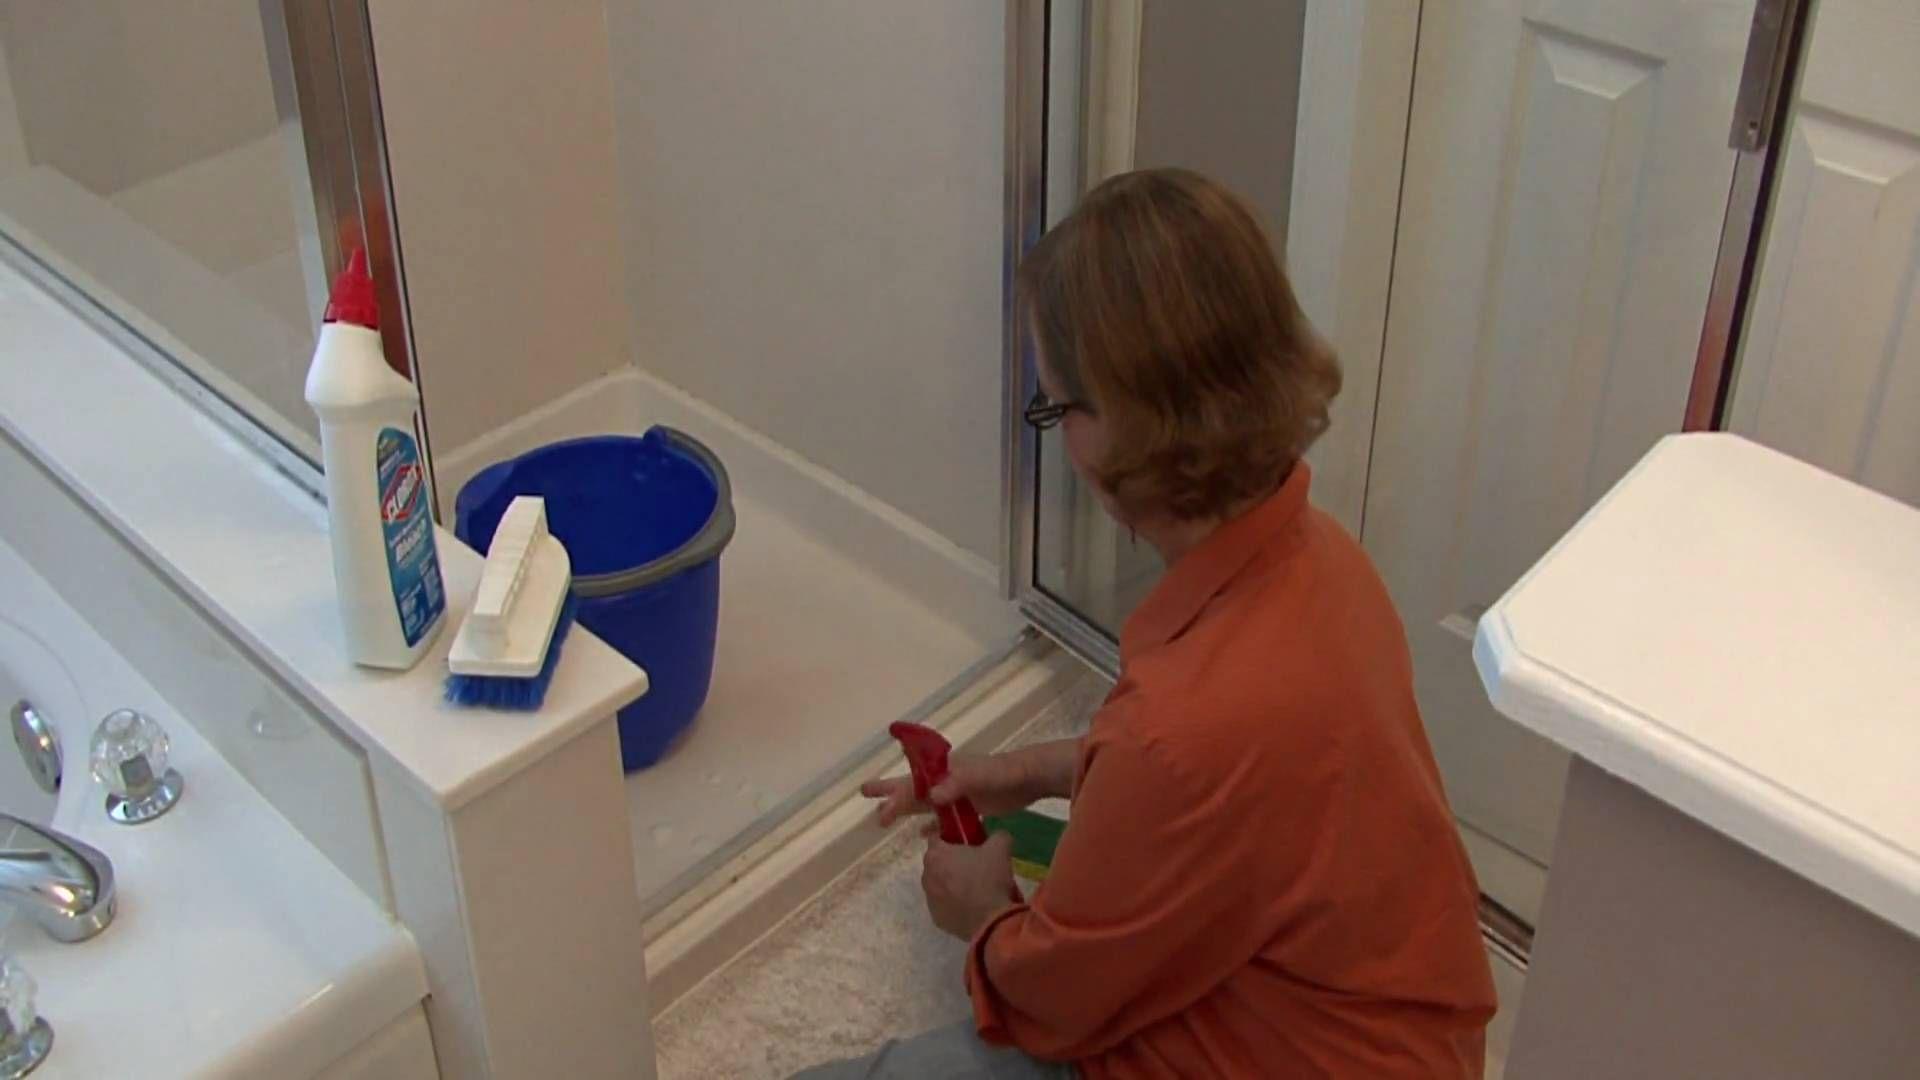 Bathroom Cleaning Tips How to Clean Shower Door Tracks